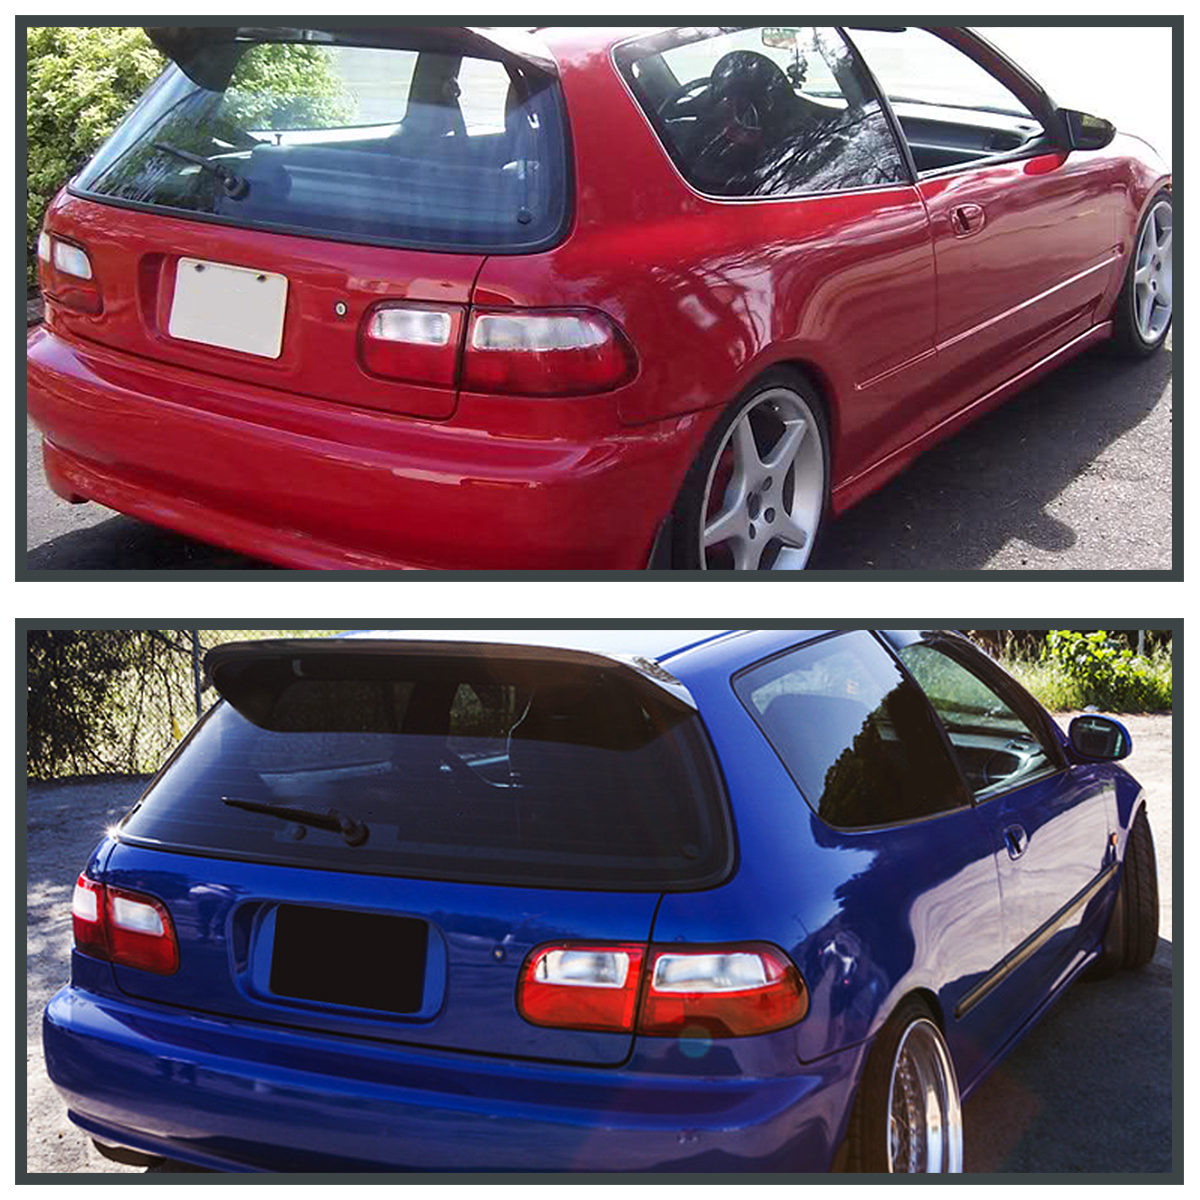 Captivating For 92 95 Honda Civic Hatchback 3Dr Brake Lamps Red/ Clear Tail Lights